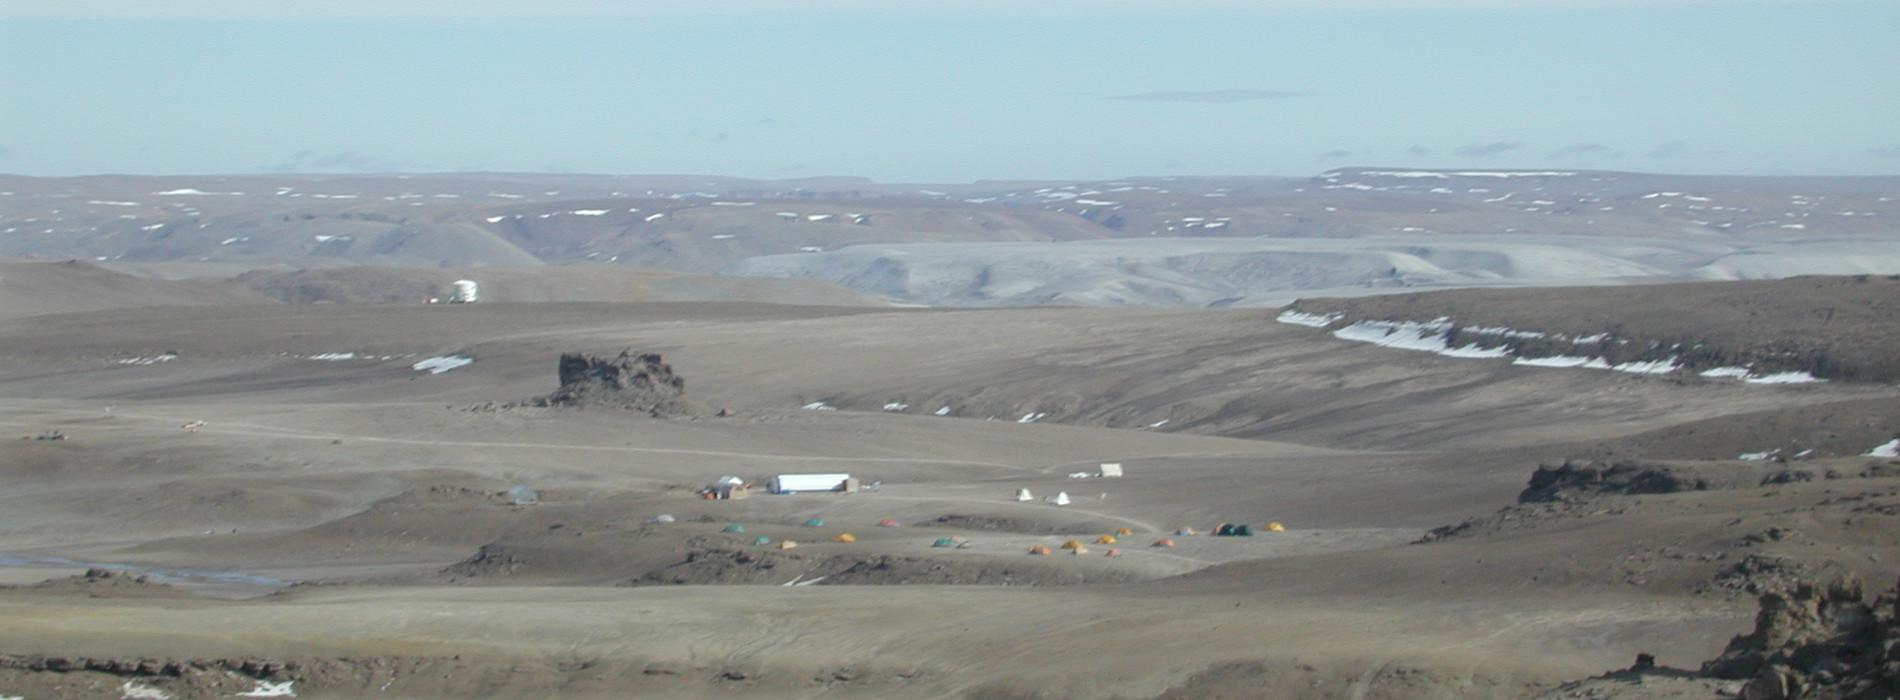 Haughton-Mars Project base camp